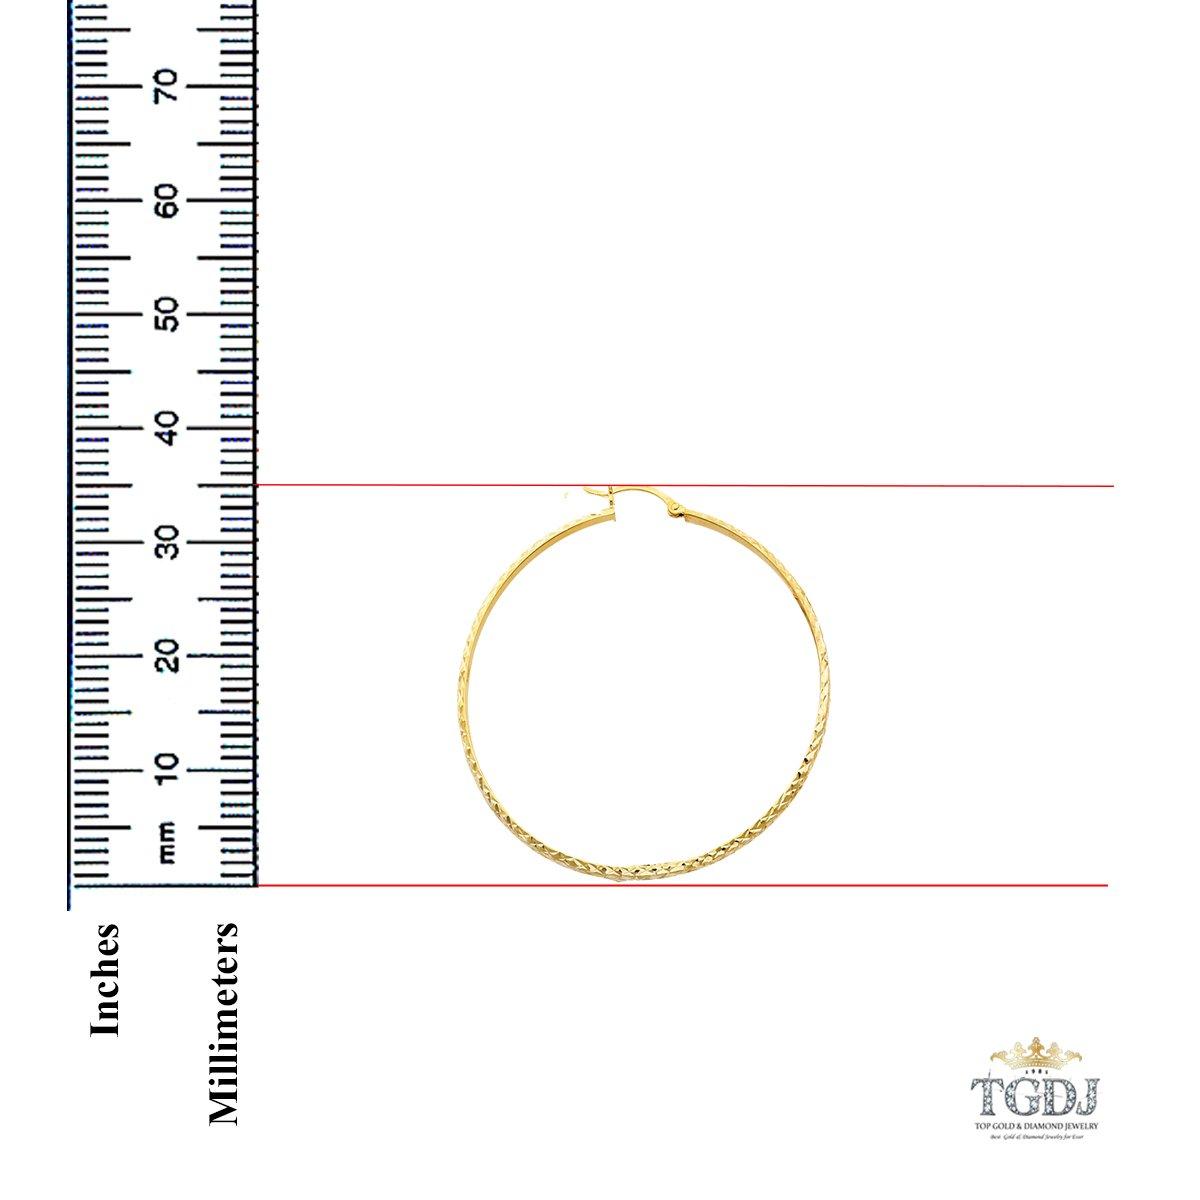 14K Yellow Gold 3mm Diamond Cut Hoop Earrings Diameter - 35mm